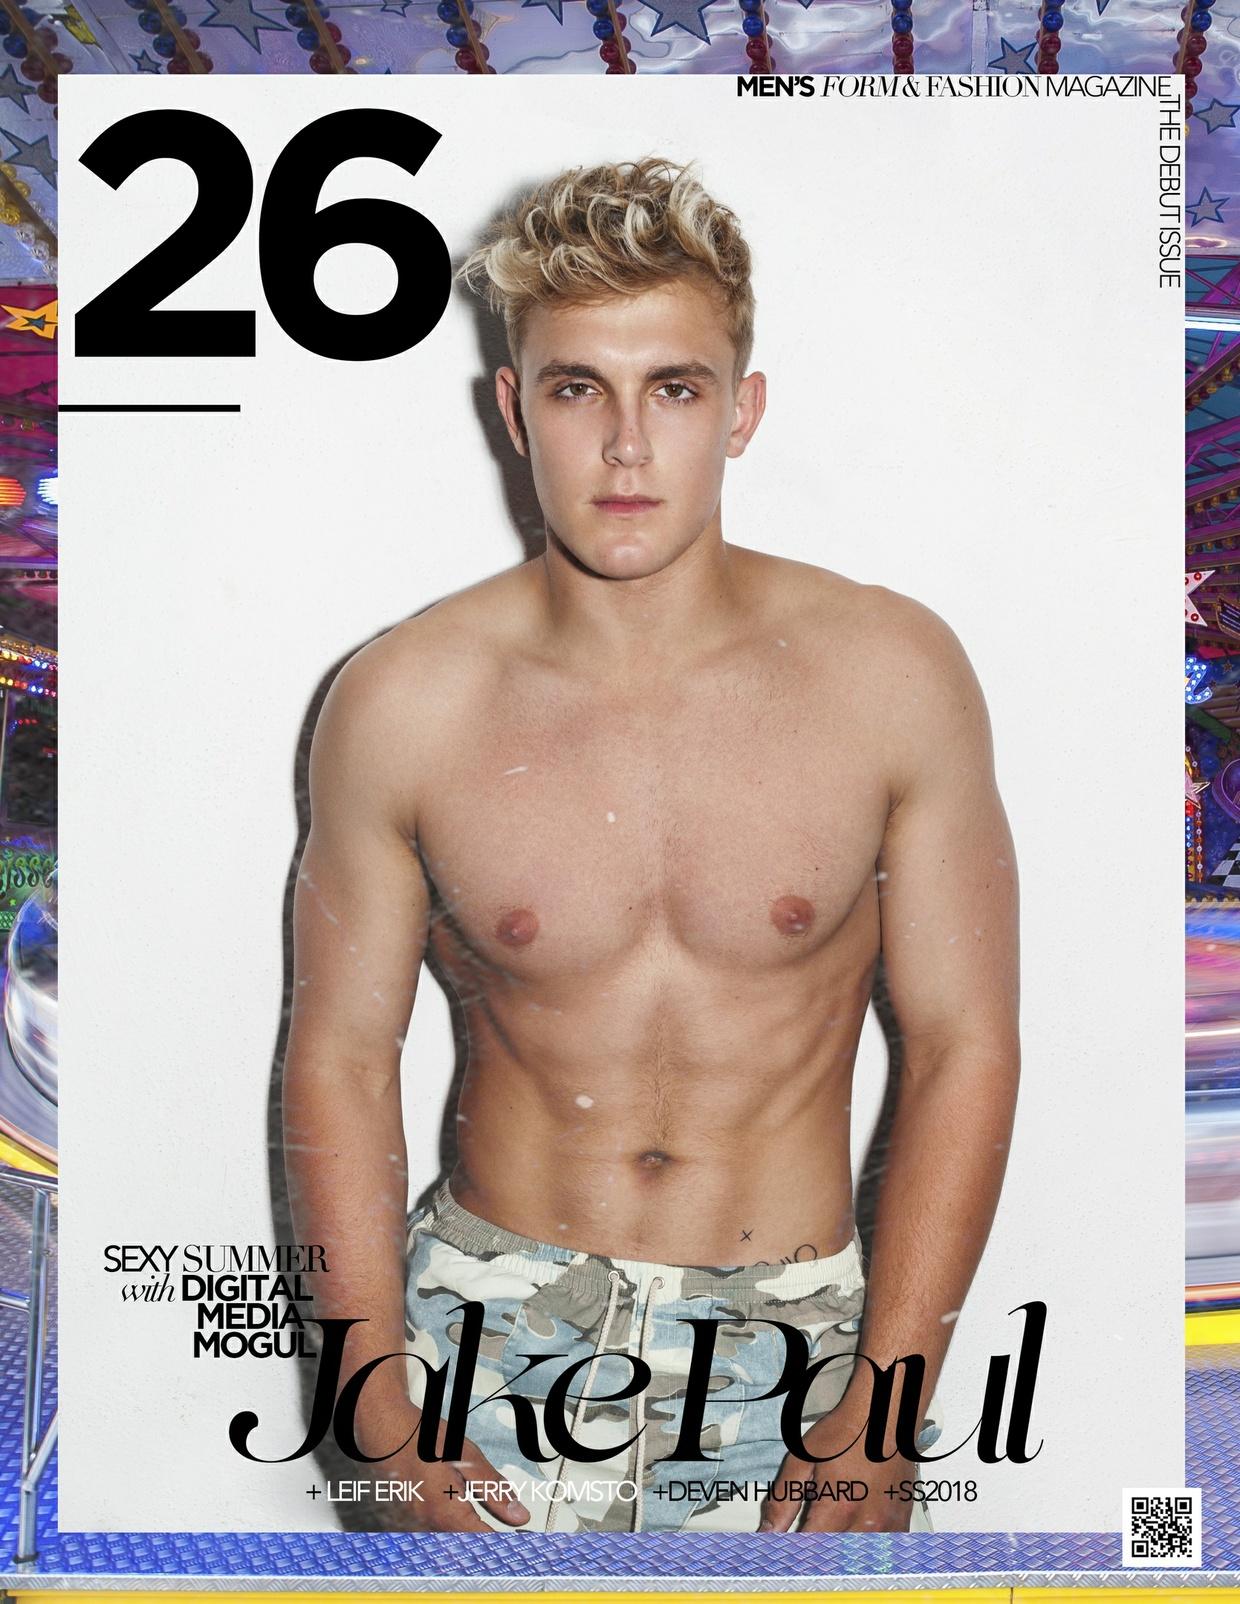 26 Magazine Debut Issue ft. Jake Paul